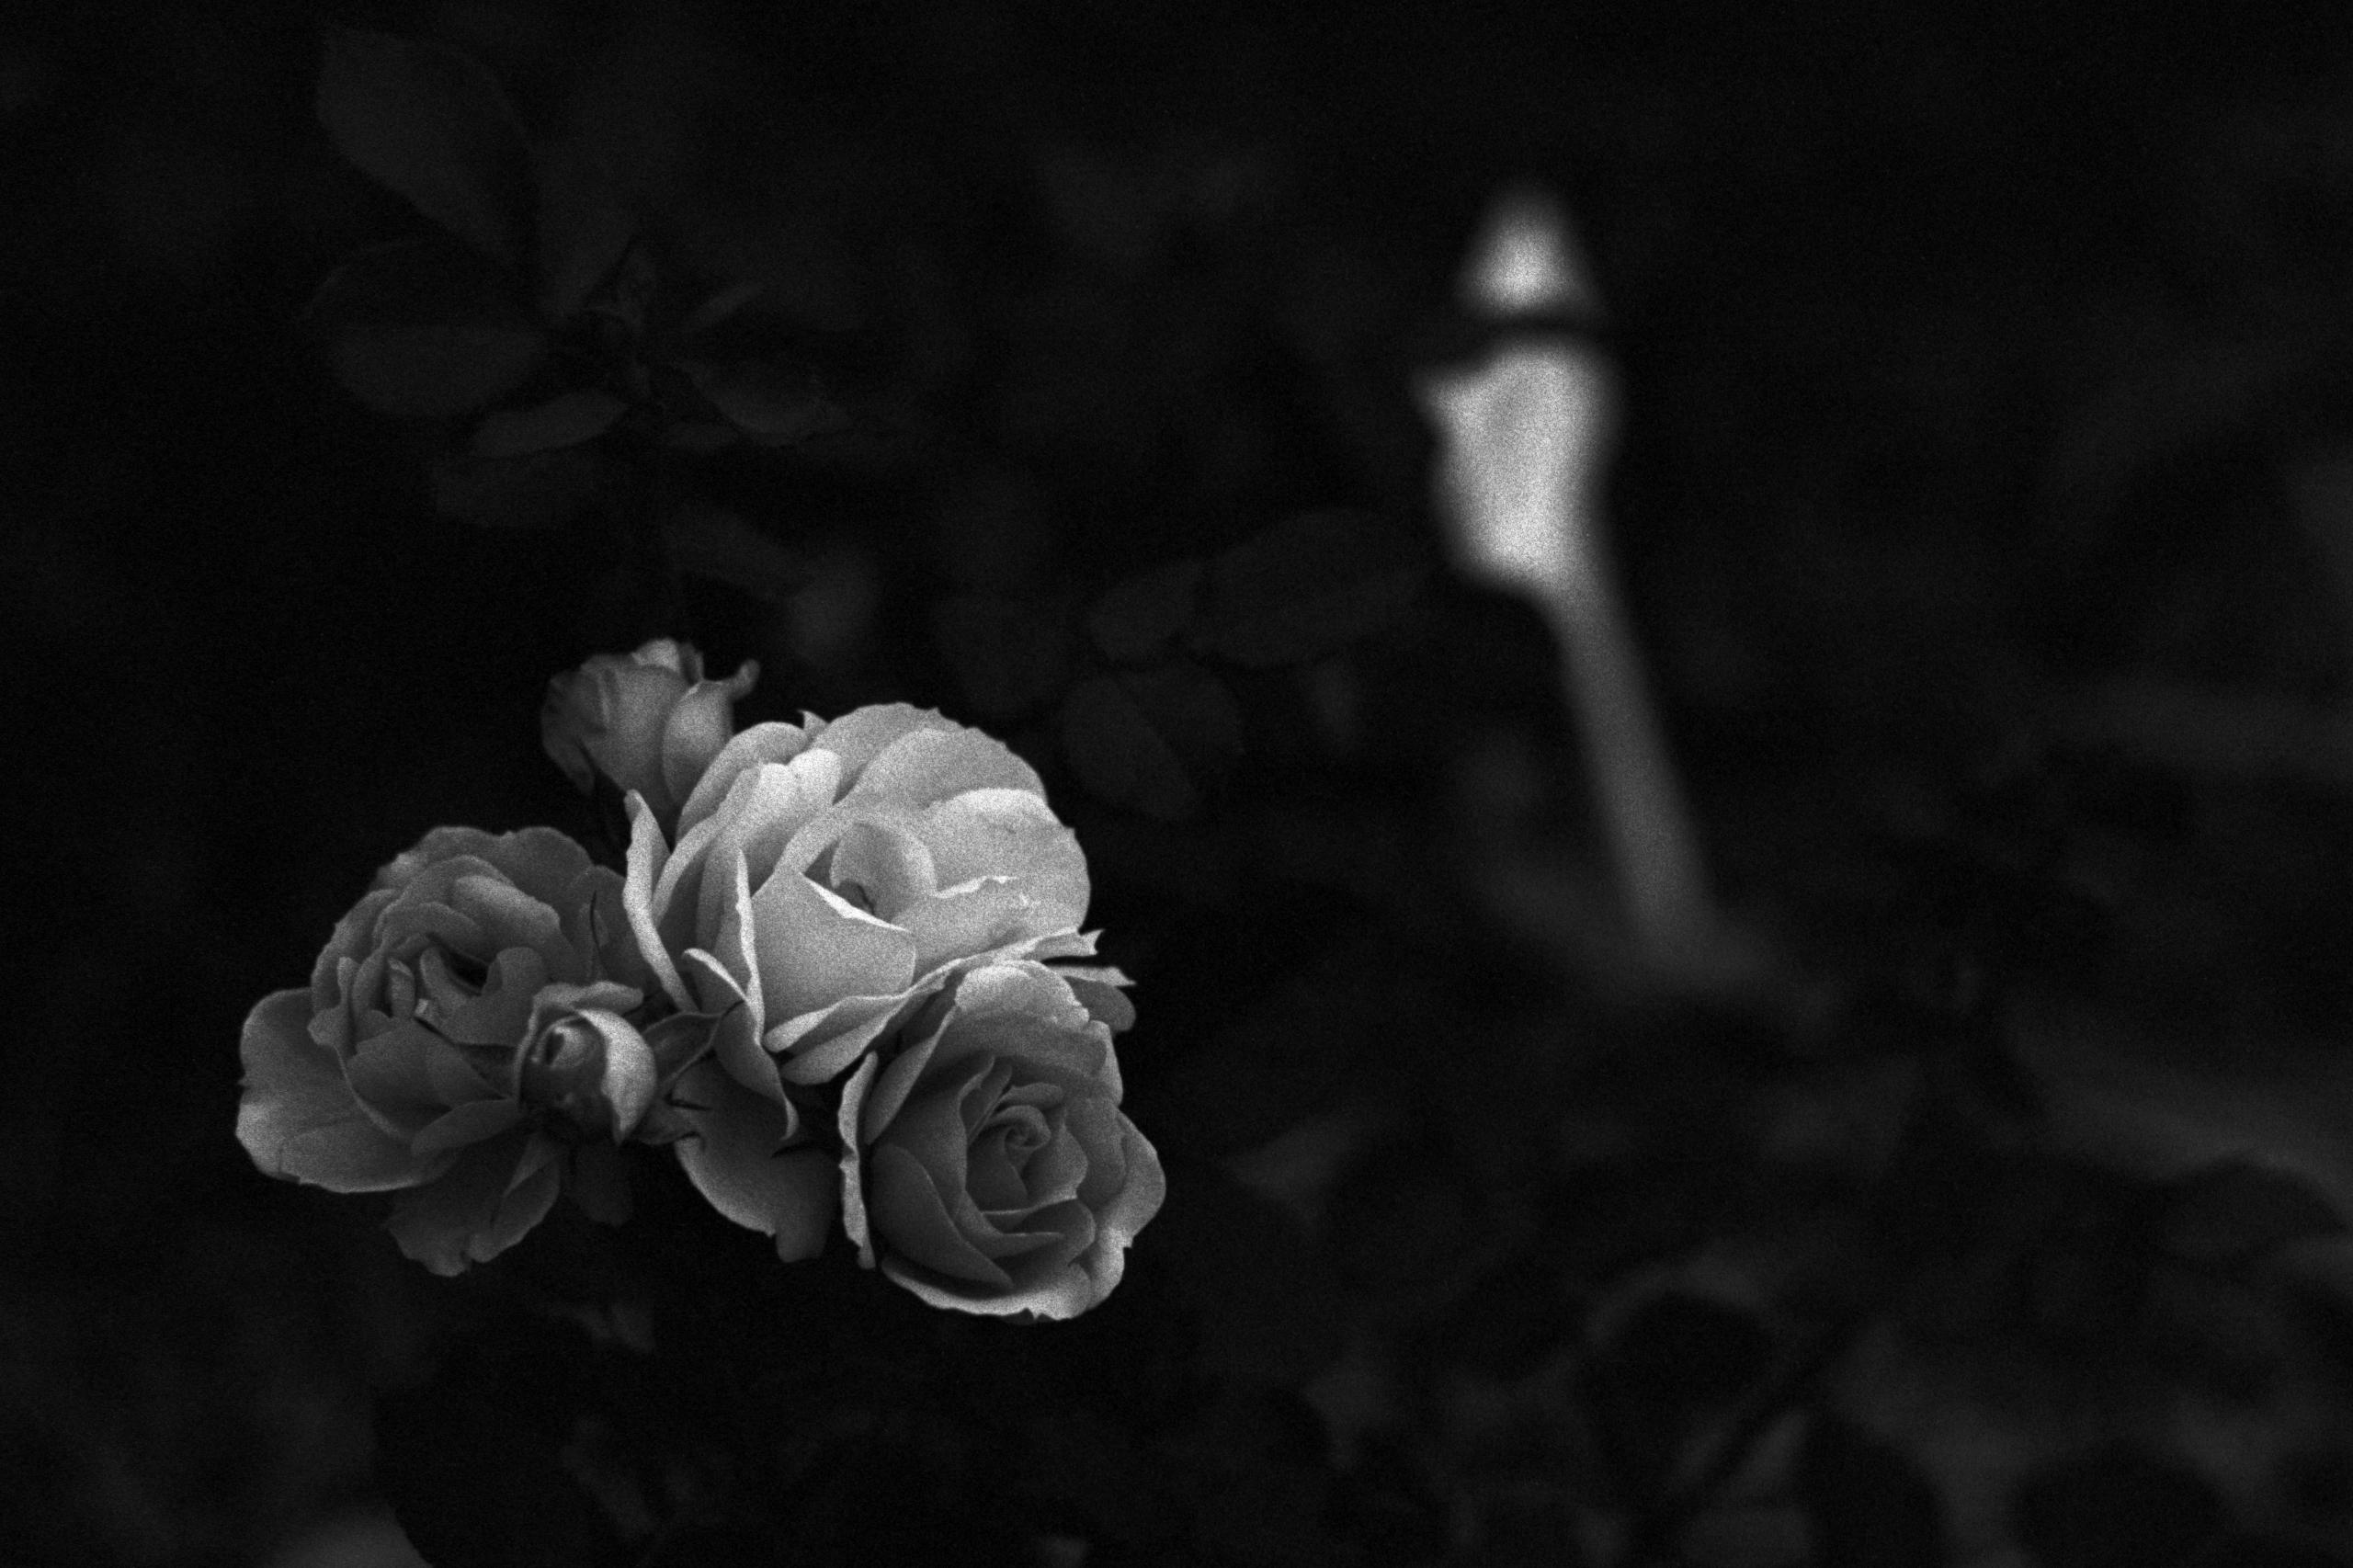 Roses Tamborine Mountain Botani - dropshot | ello